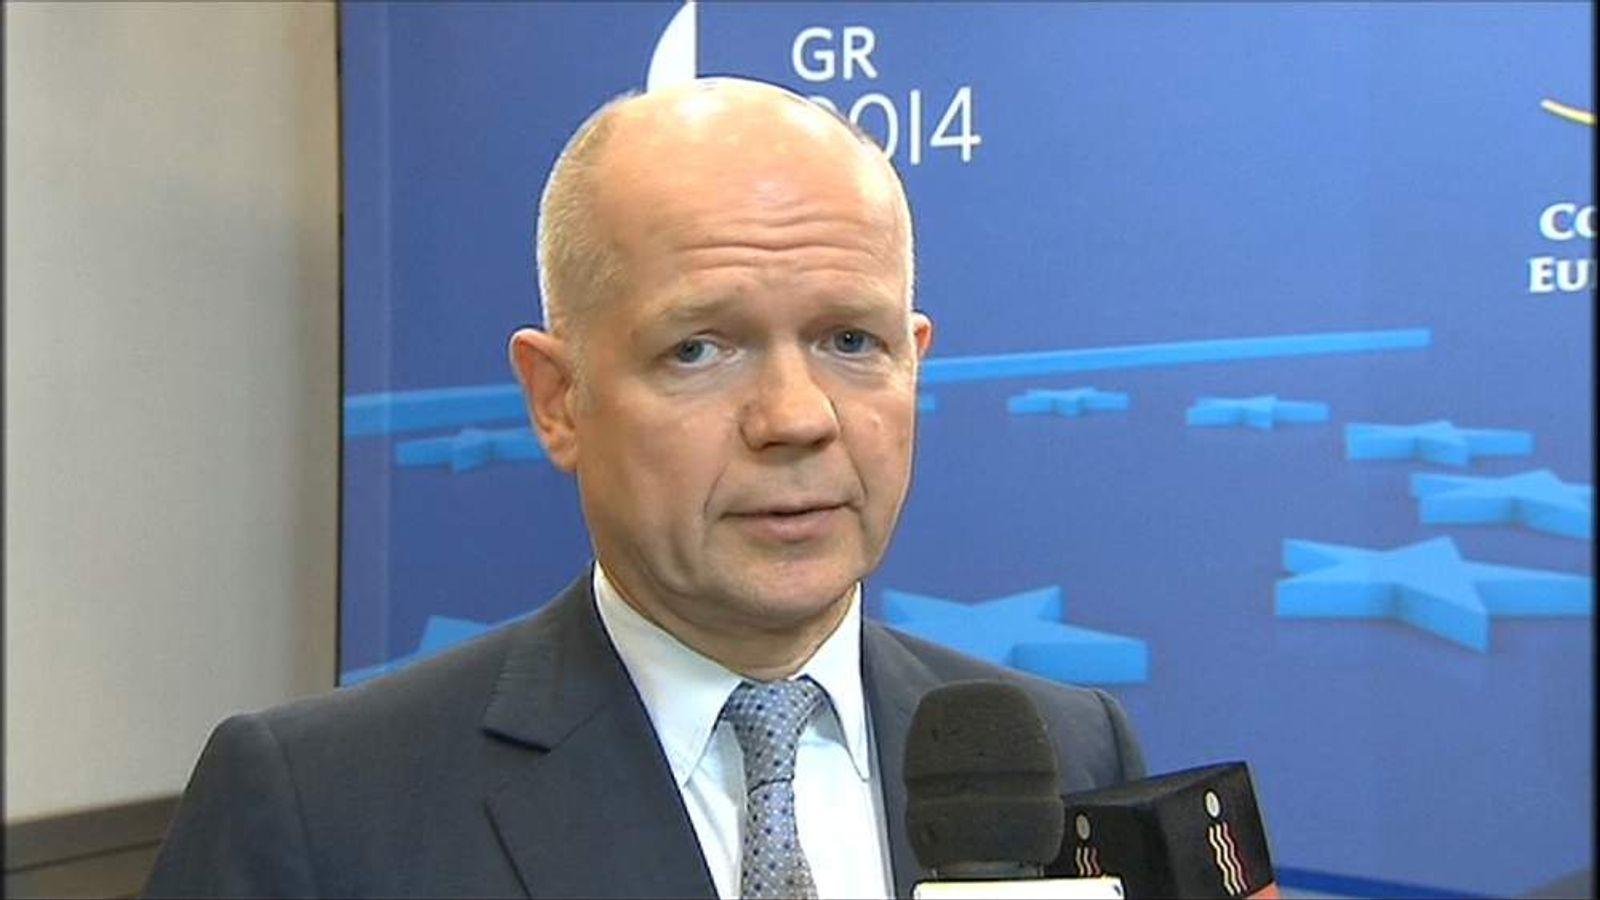 Foreign Secretary William Hague on Russia Ukraine sanctions